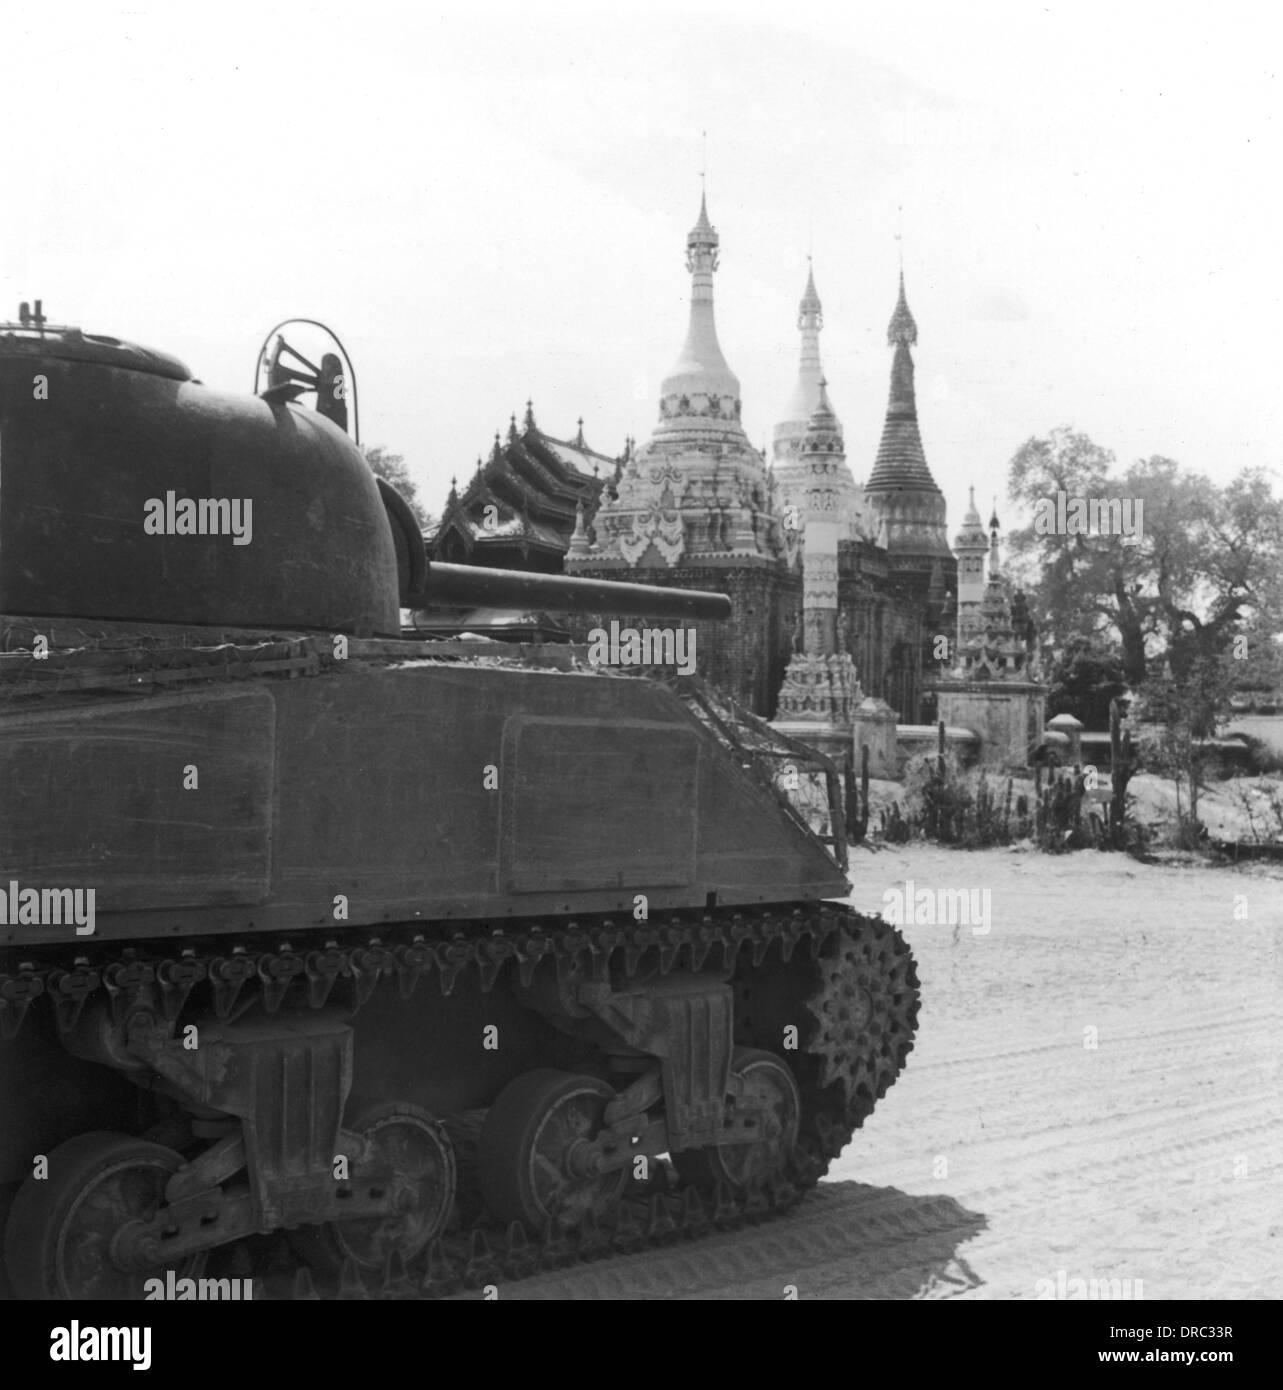 Scottish tank crew in Burma - 1945 - Stock Image